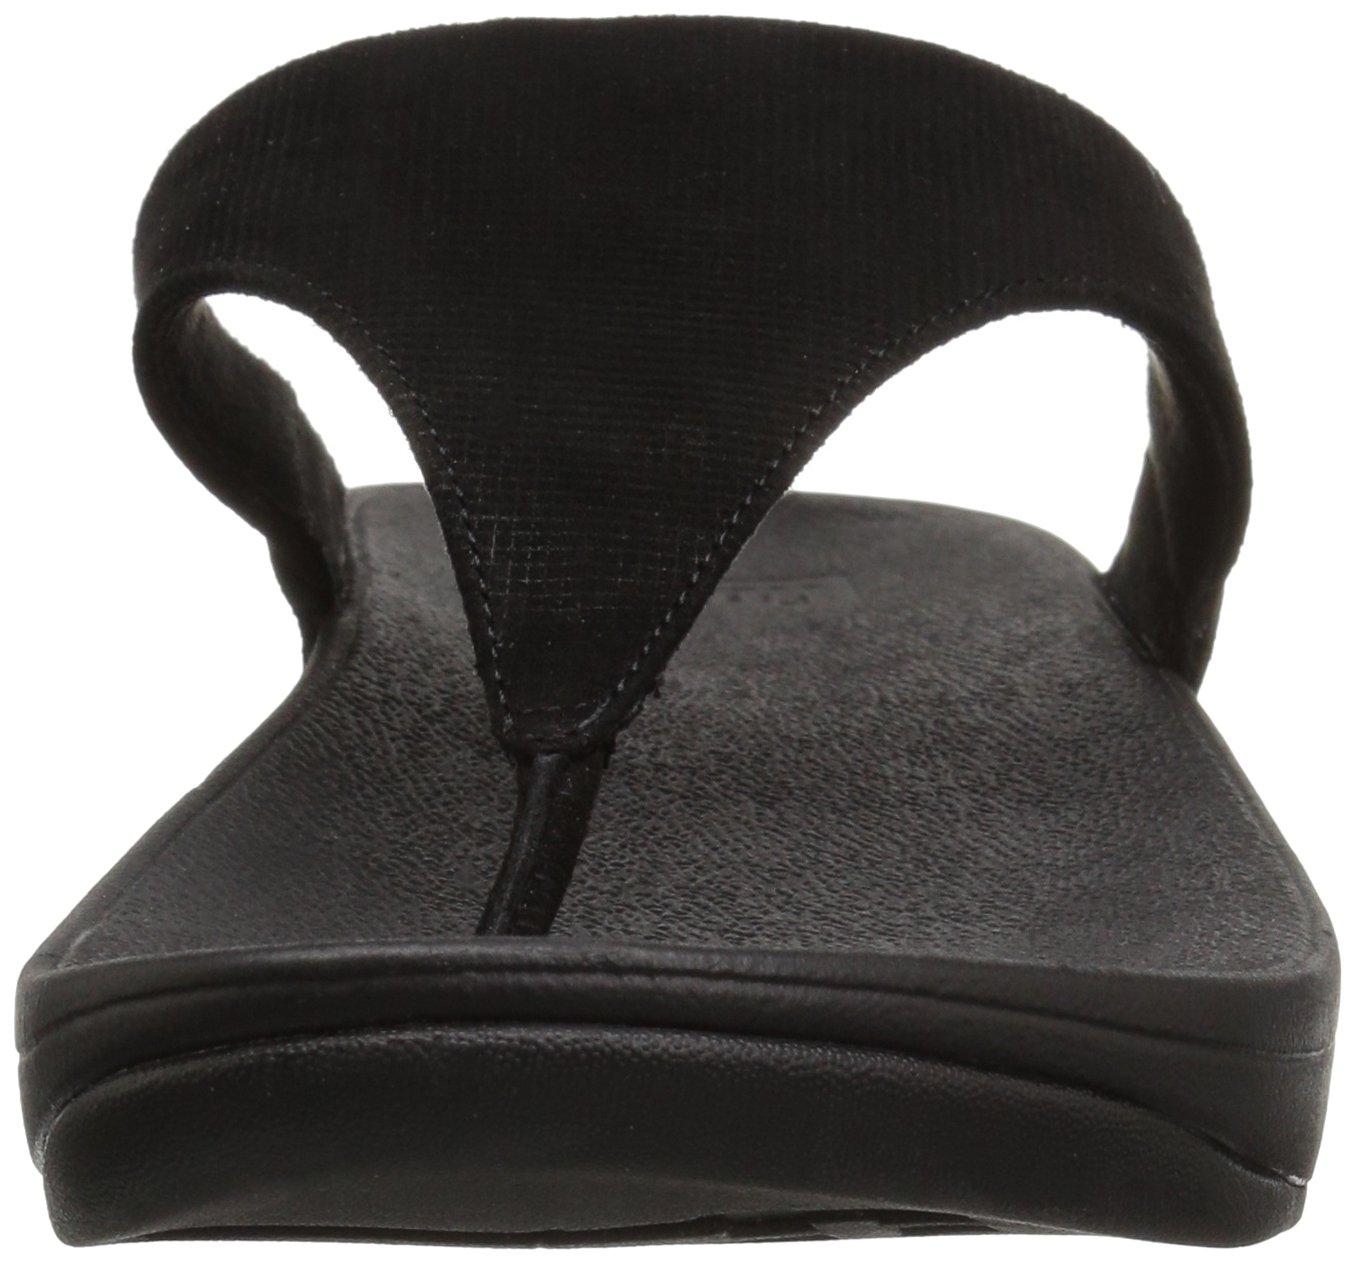 79de6847905 FitFlop Dámské Lulu Toe-Thong 16797 Shimmer-Check Lulu Toe-Thong Sandal  Černá e2c809c - norli.site